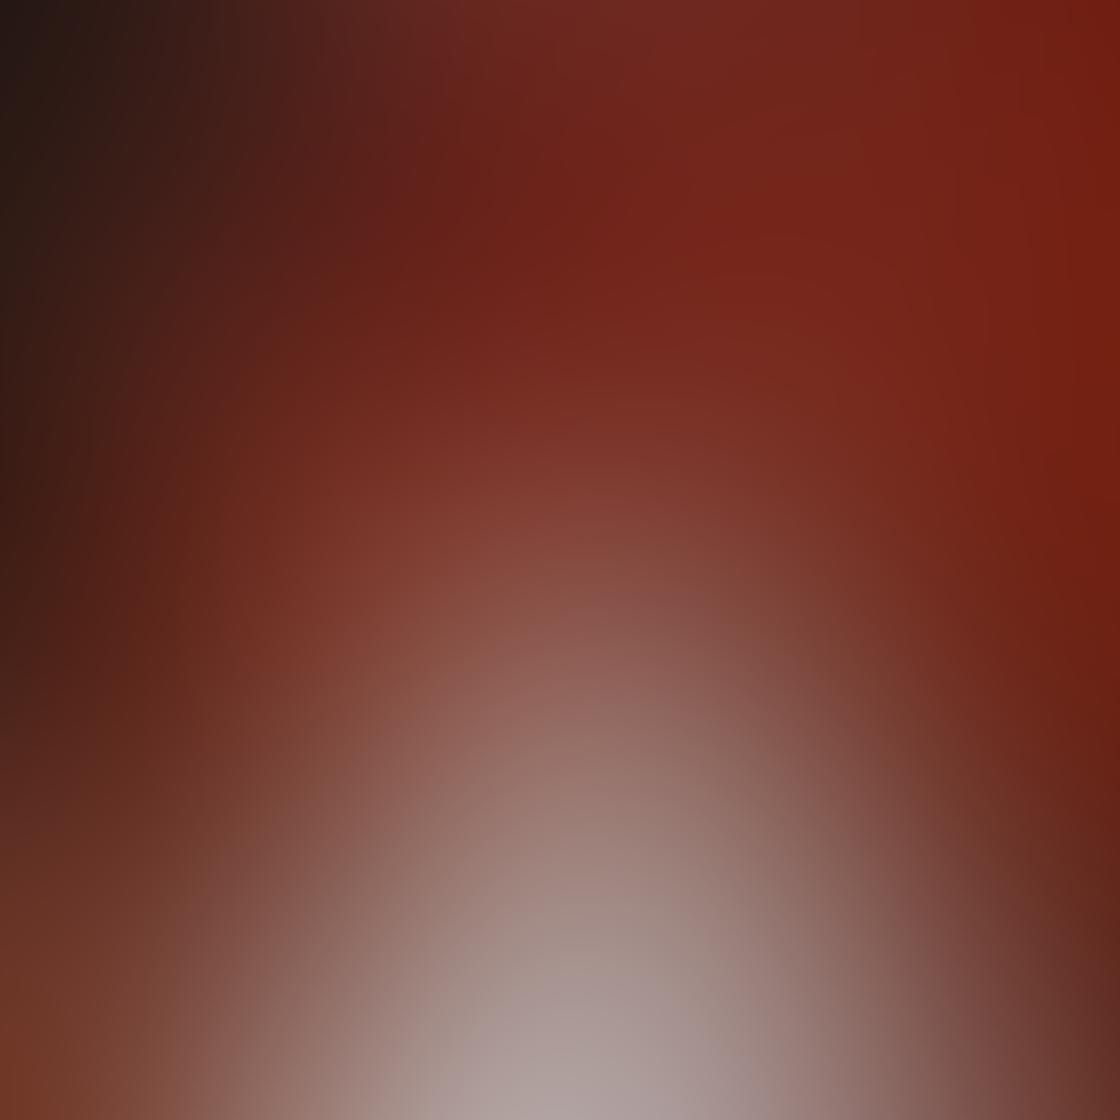 iPhone Angle Photo 08